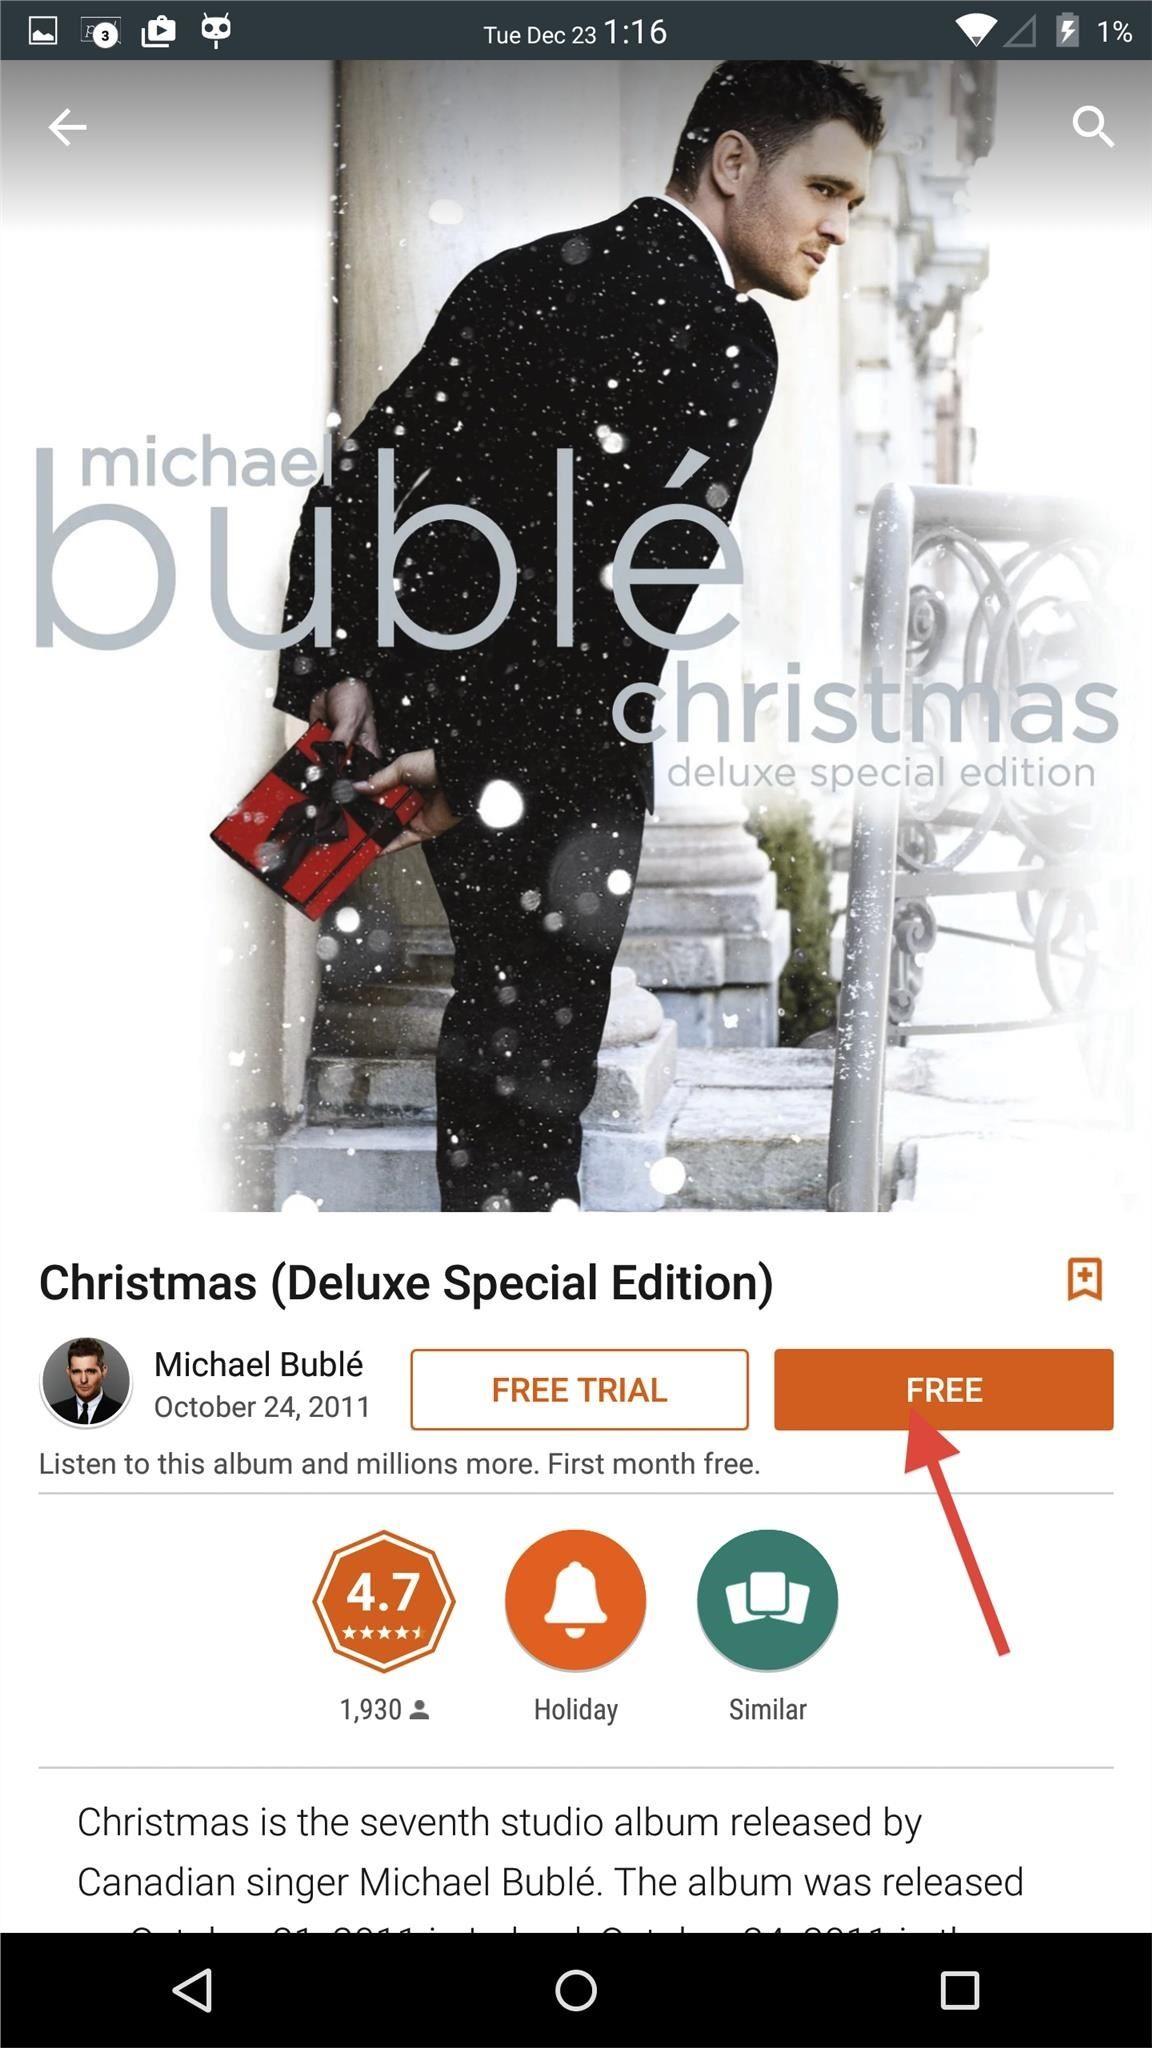 Michael Buble Christmas Album Download Zip - streameng